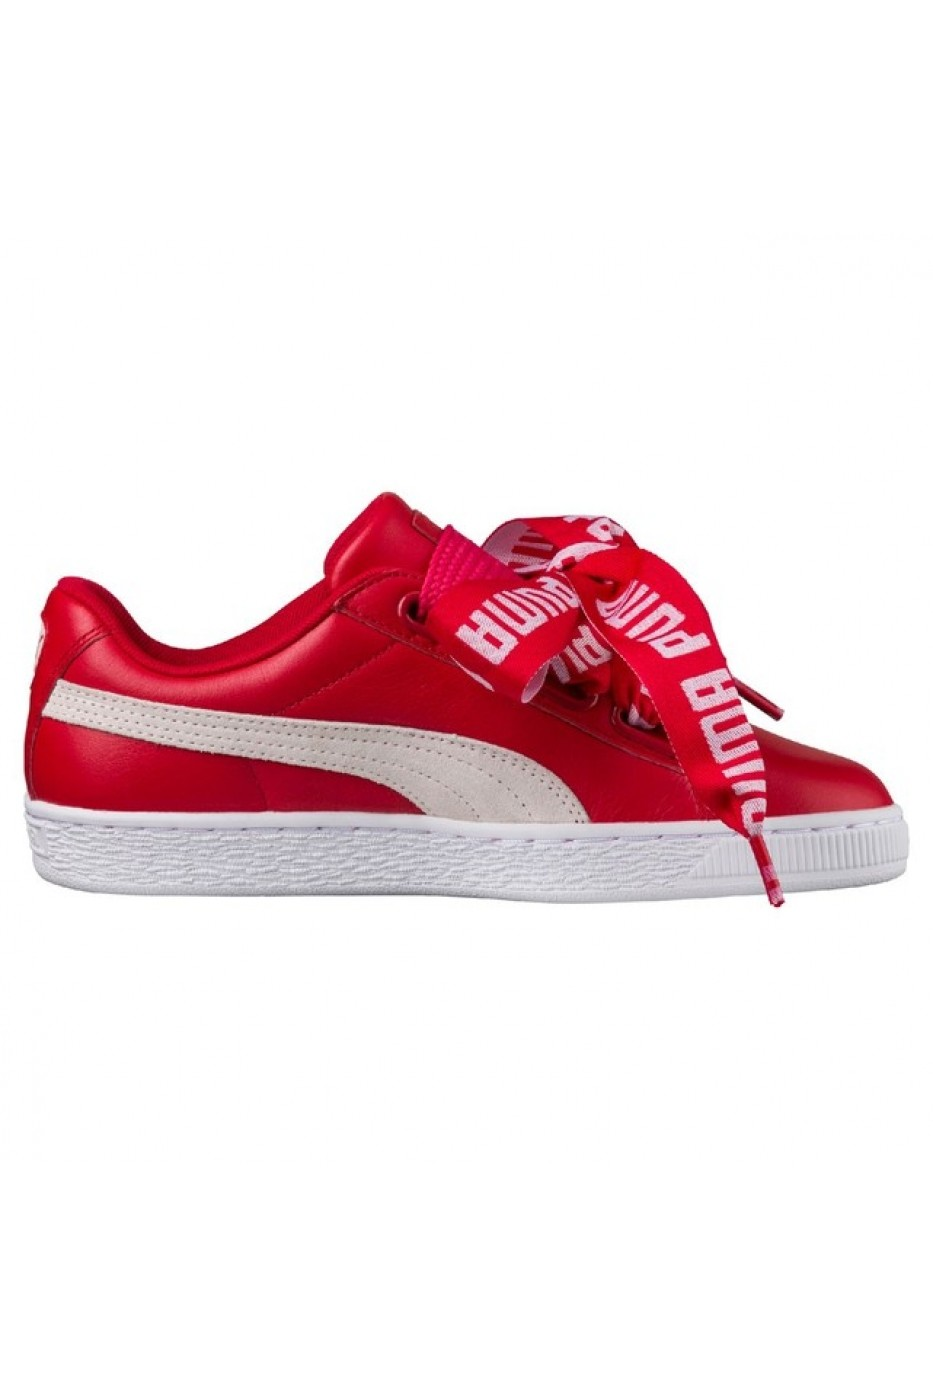 54aeeba500 Puma Sneaker cipő LRD-4785193 Piros - FashionUP!